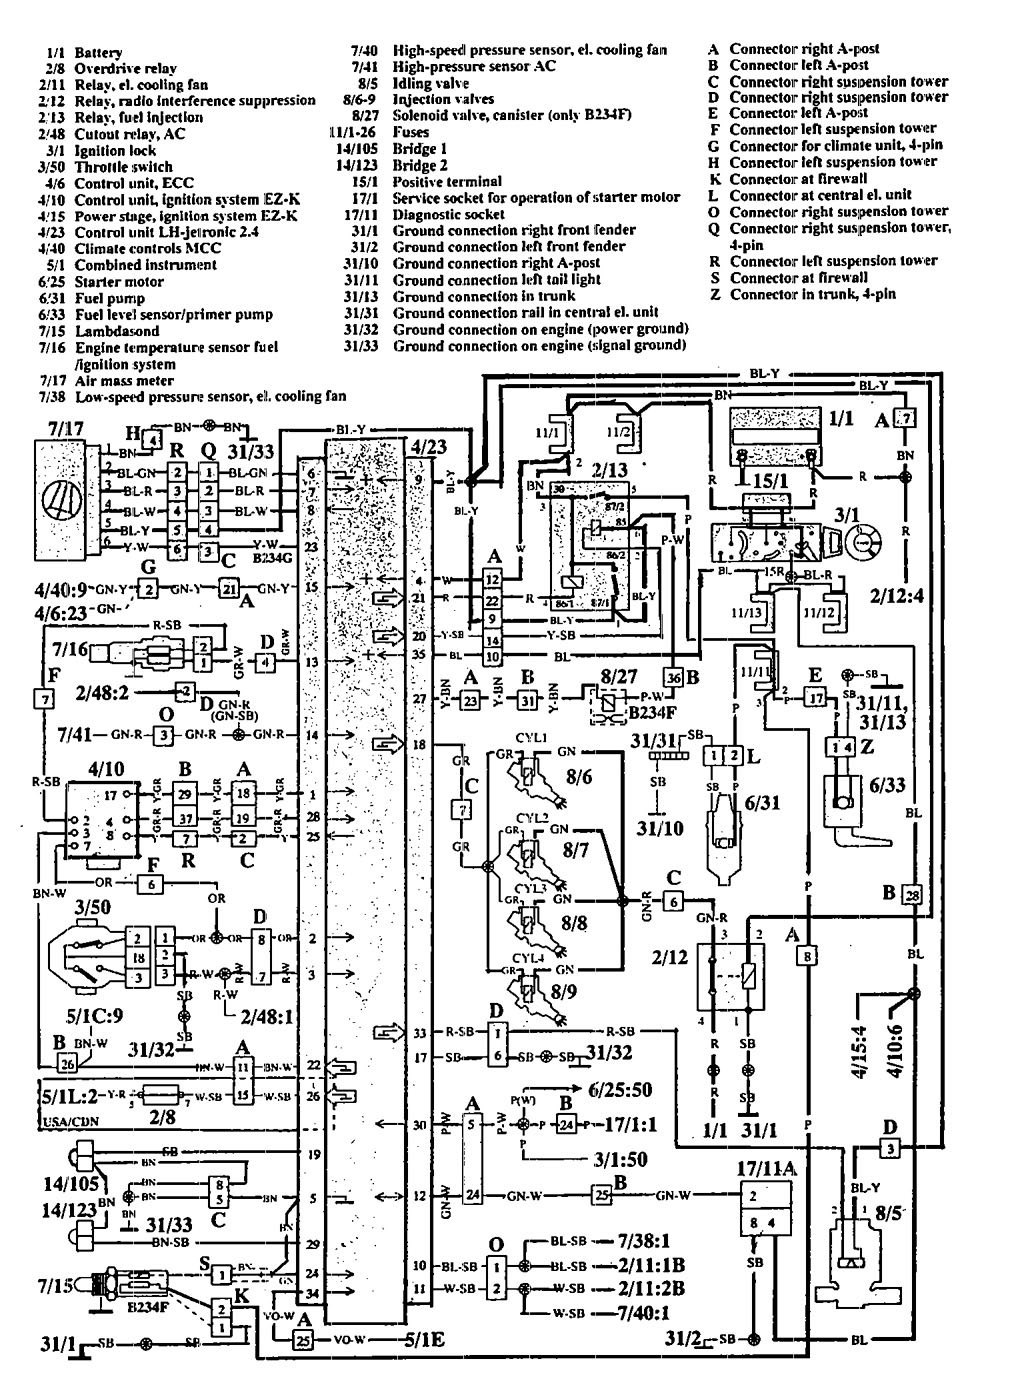 [SCHEMATICS_4FR]  LT_5518] 1995 Volvo 960 Wagon 6 Cyl Fuse Box Diagram Free Diagram   1992 Volvo 240 Wiring Schematic      Osuri Kweca Mohammedshrine Librar Wiring 101